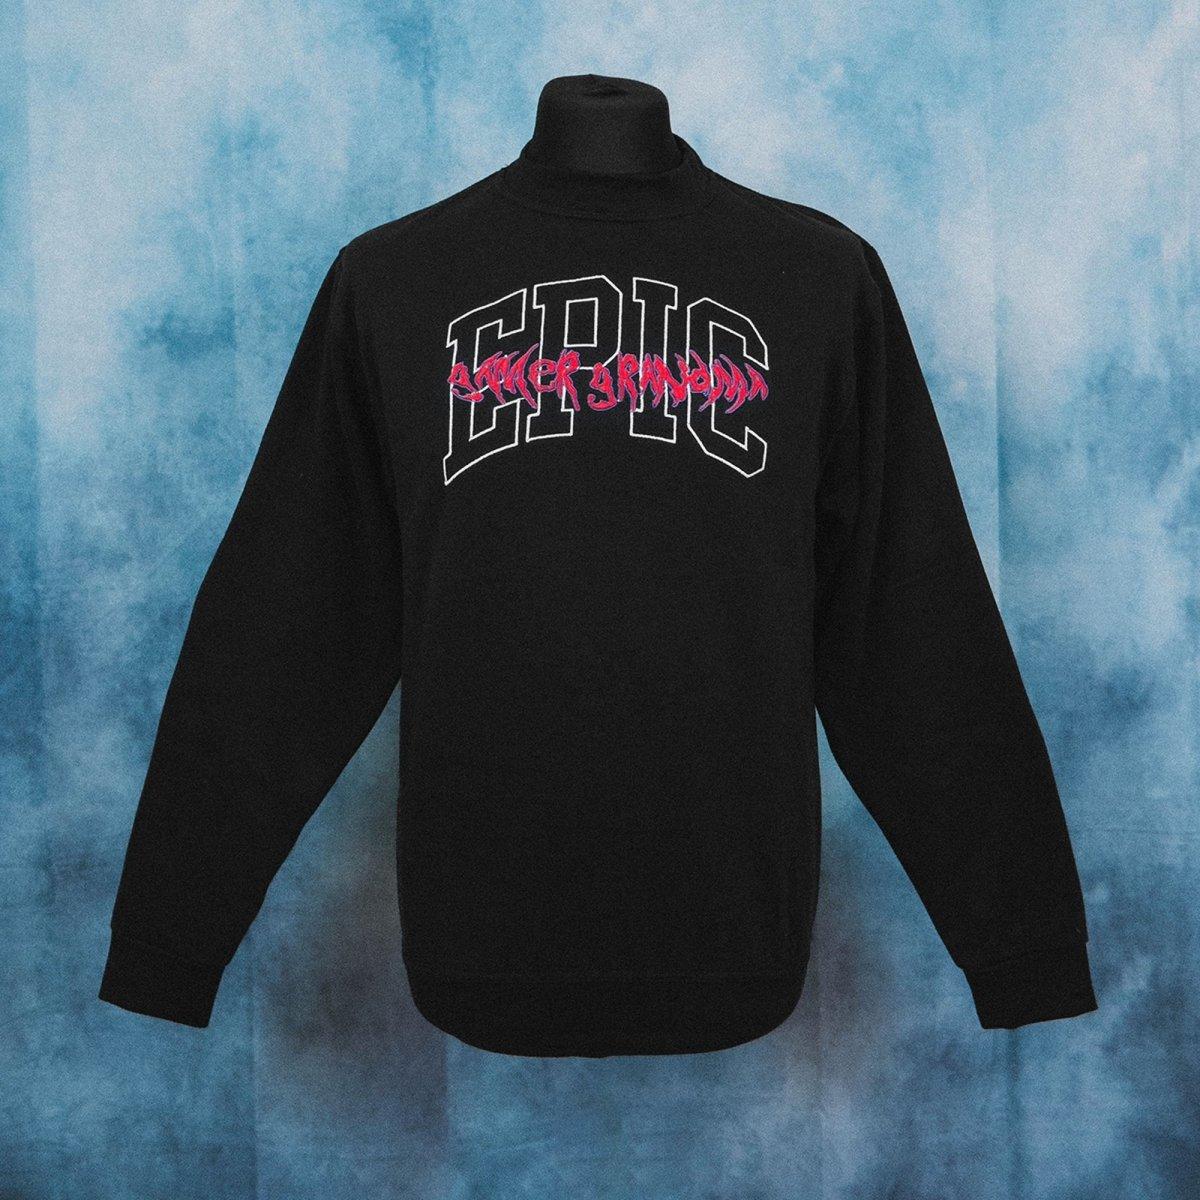 Epic Gamer Grandma - College Black Unisex Embroidered Sweater